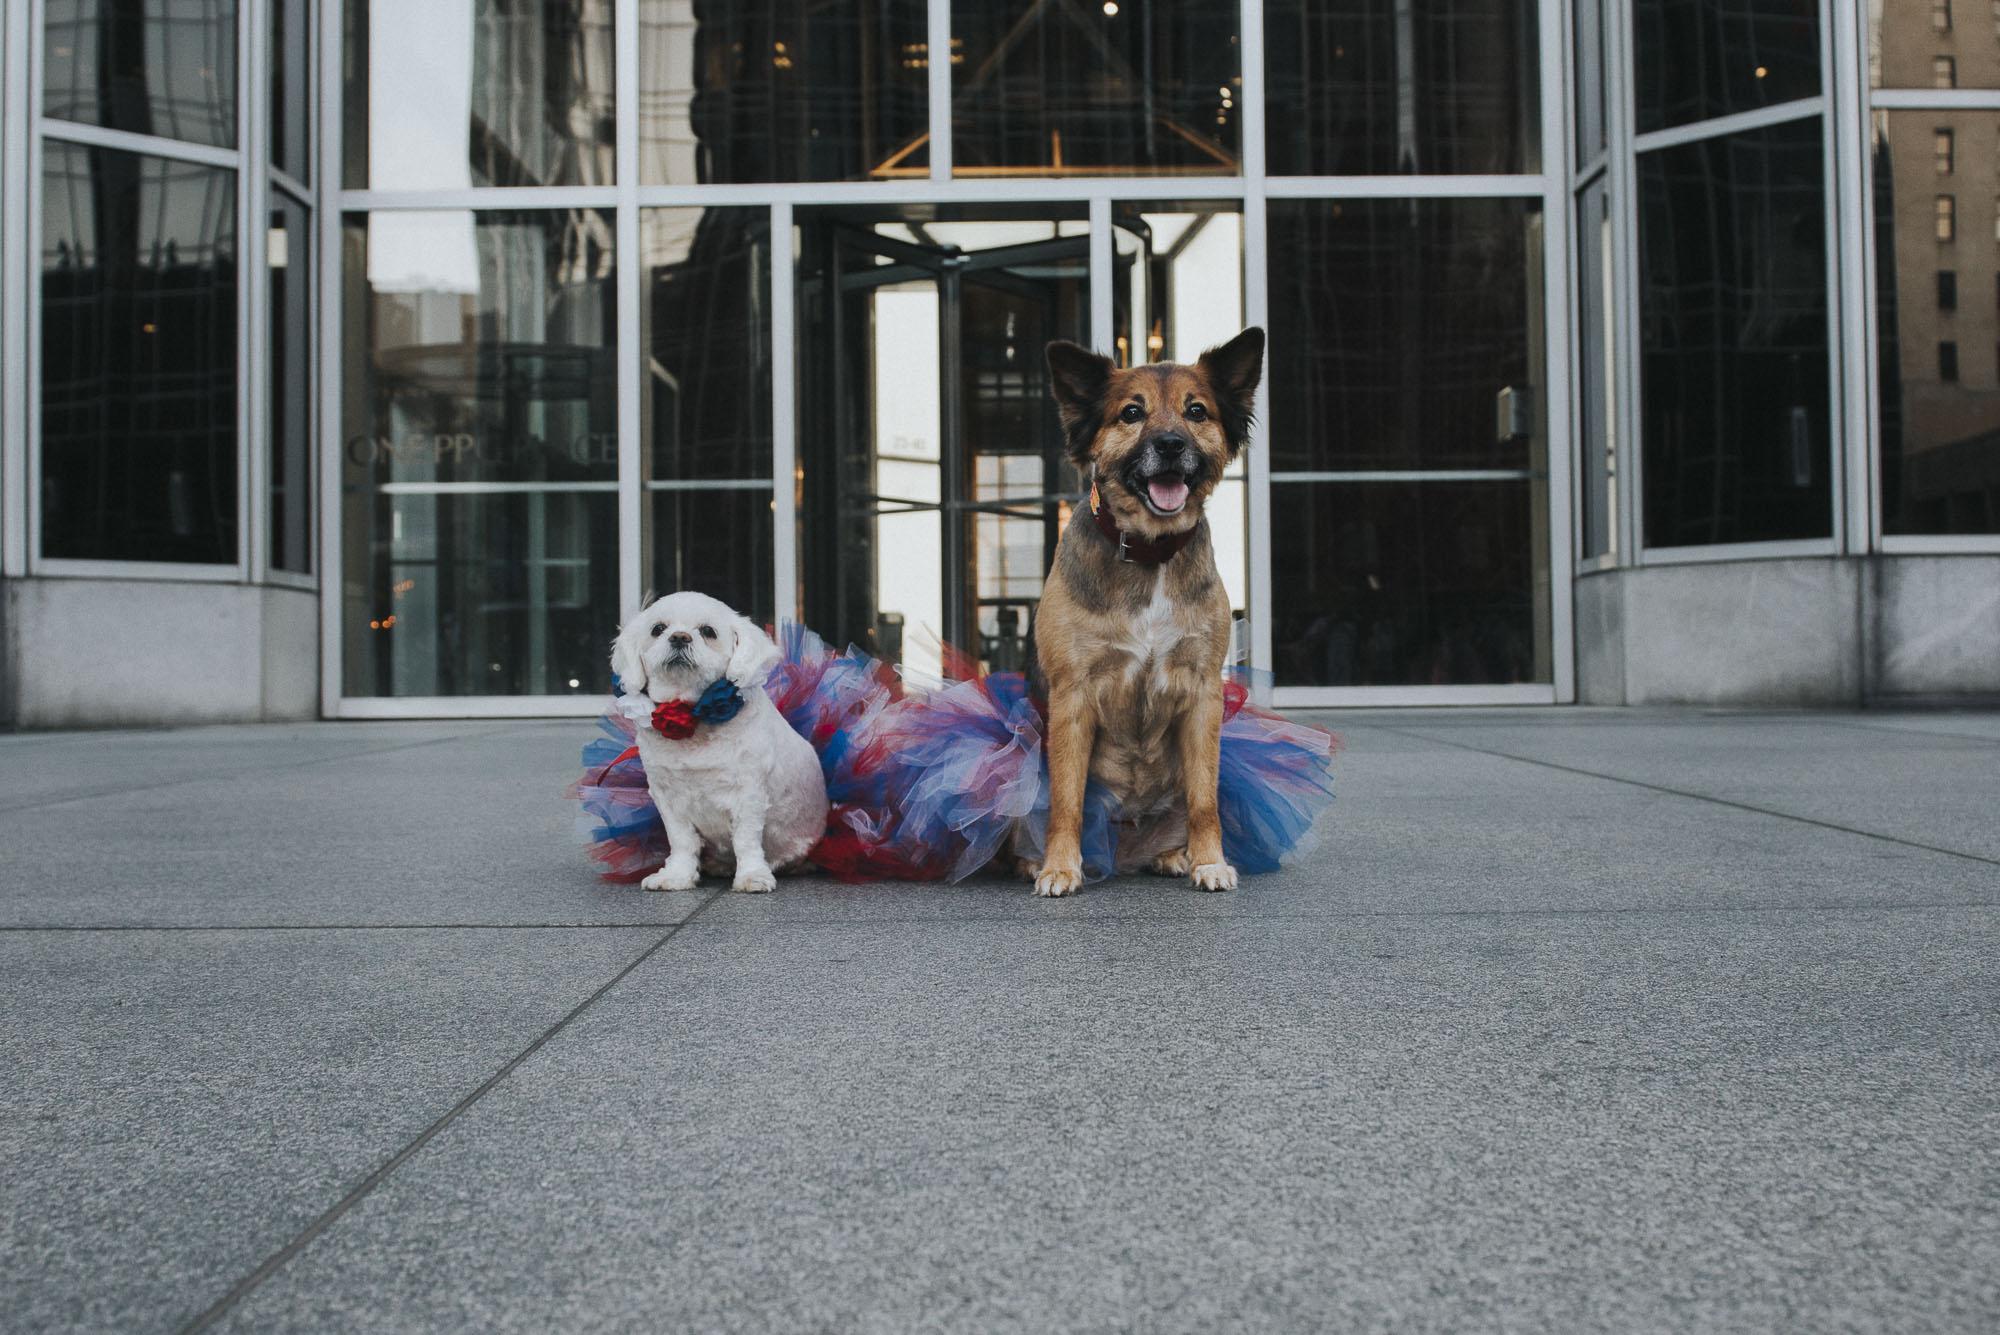 Dogs-ppg077138.JPG